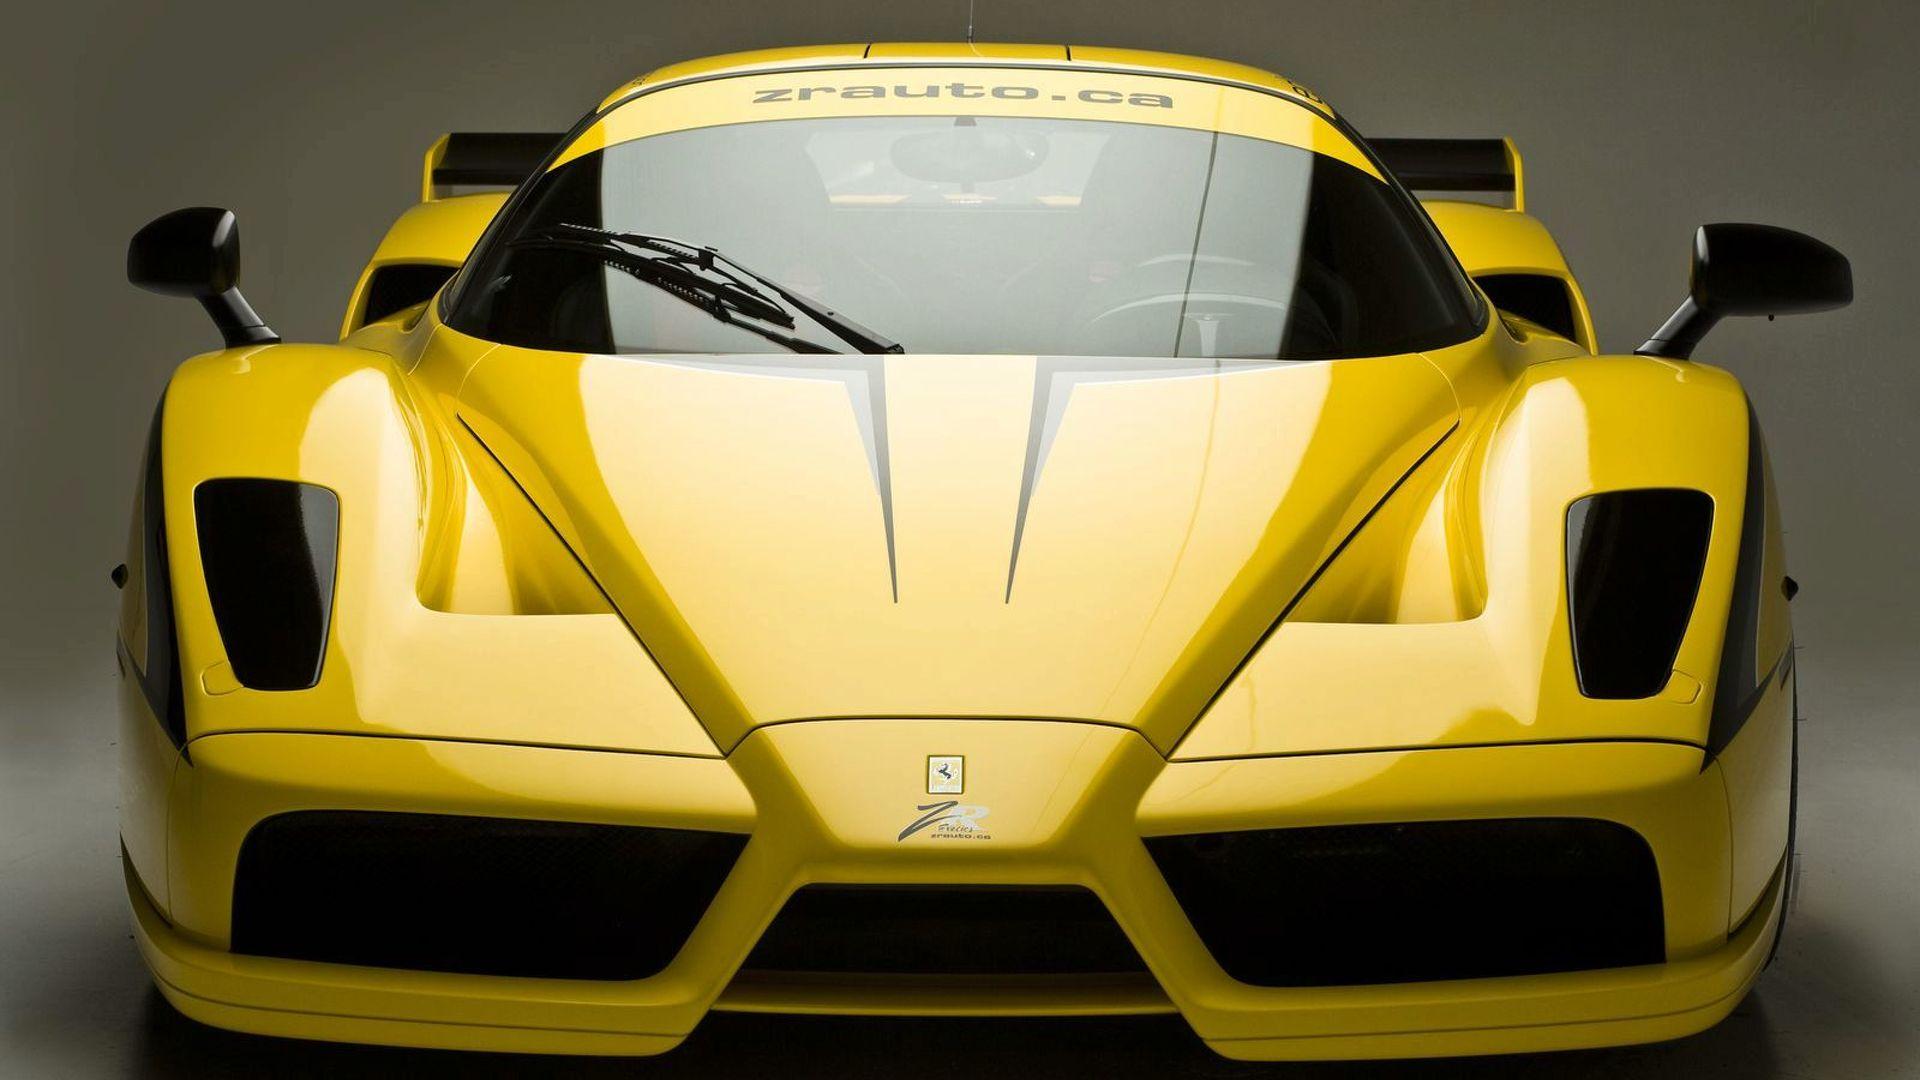 2012 Ferrari Enzo special series announced, five new models